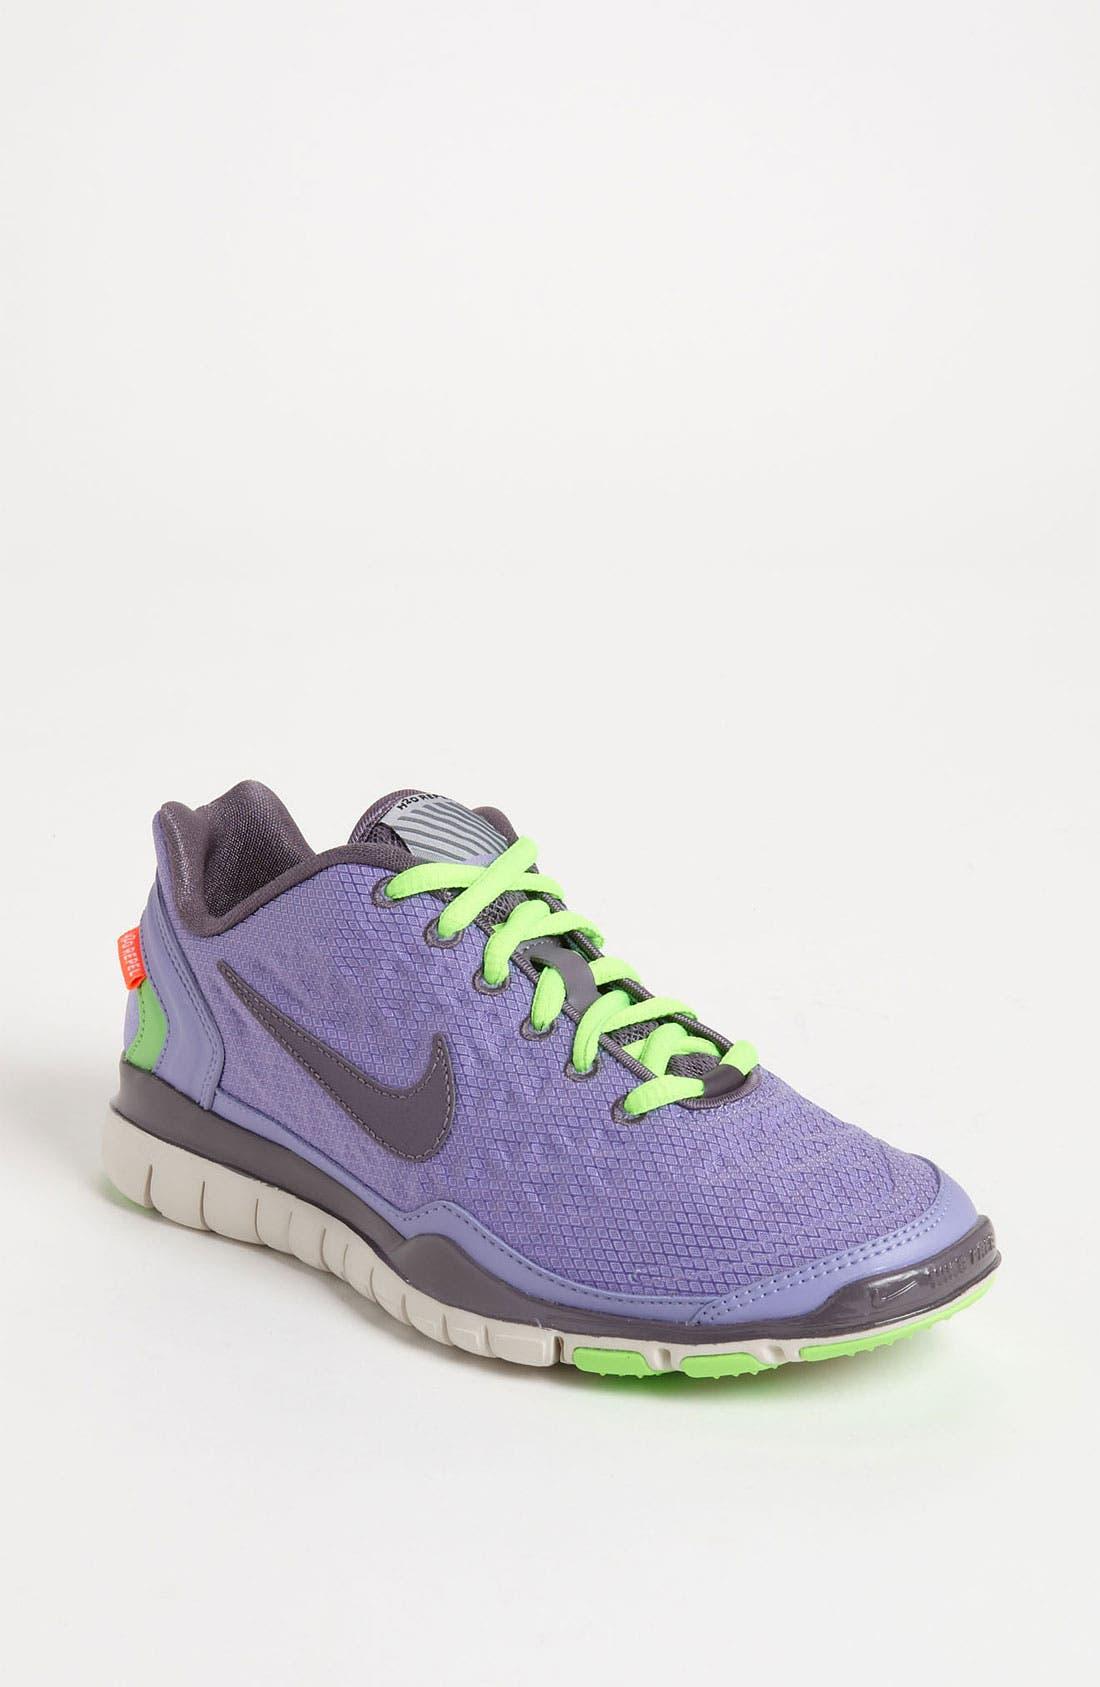 Alternate Image 1 Selected - Nike 'Free TR Fit 2 Shield' Training Shoe (Women)